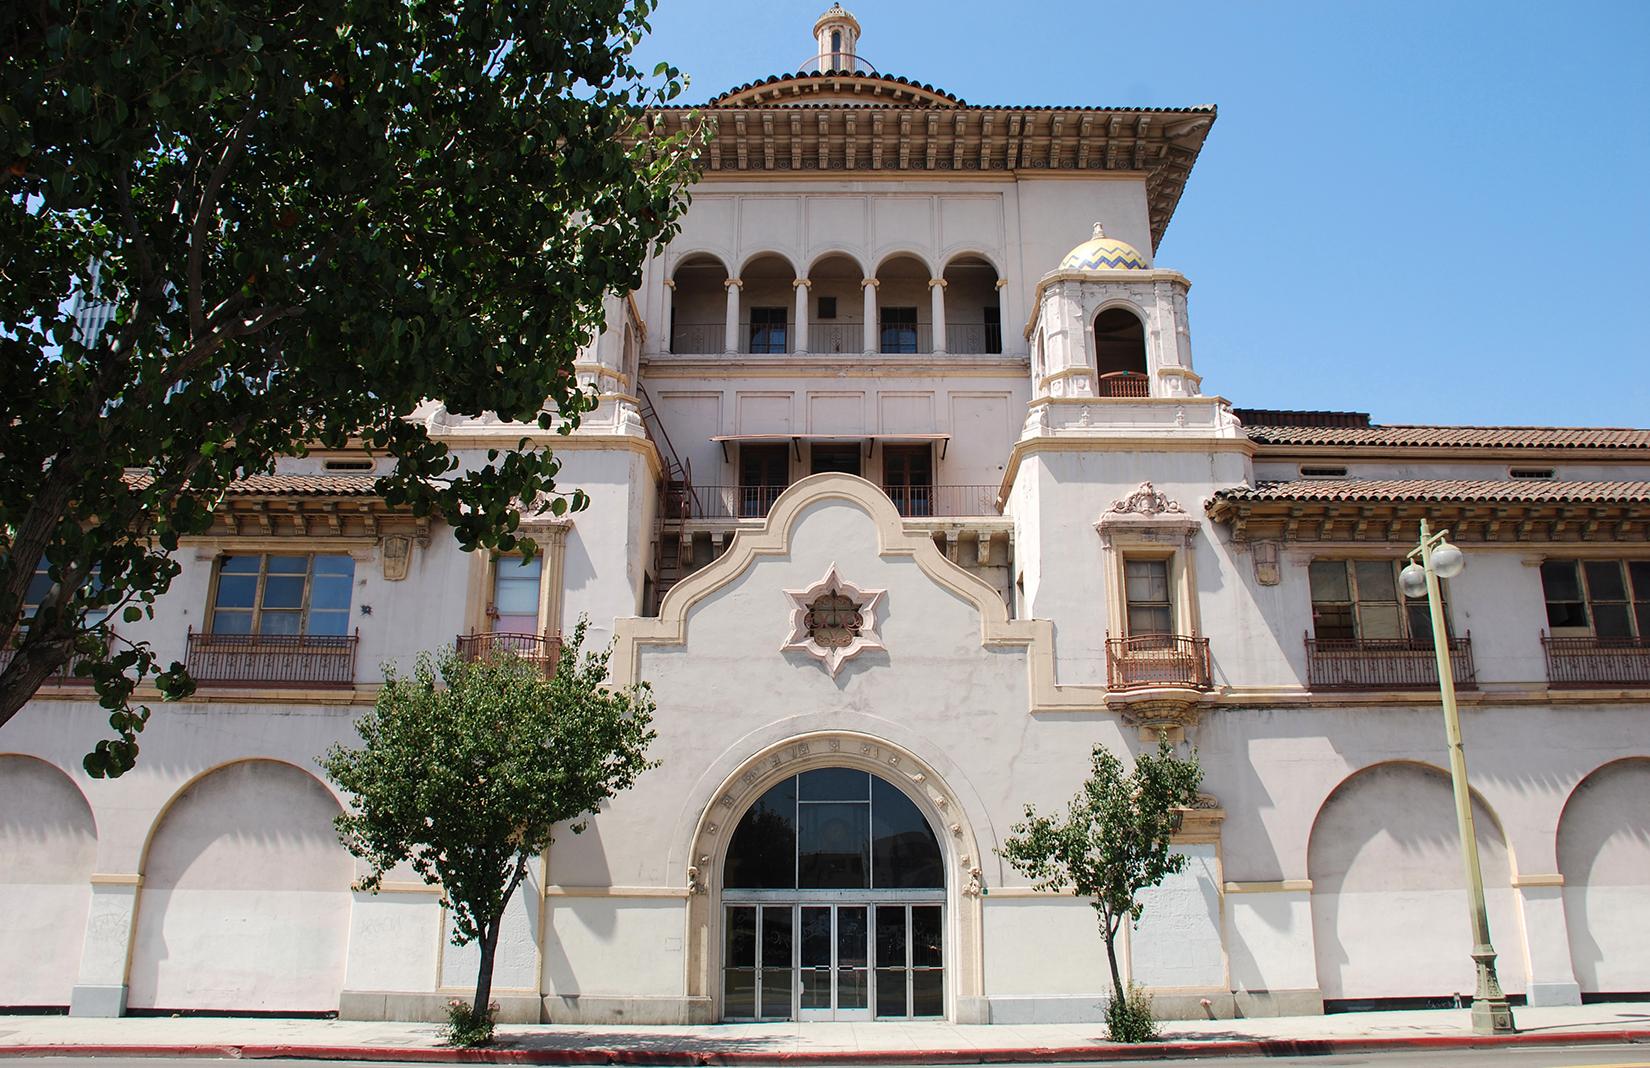 Herald Examiner Building 2 Floyd B Bariscale